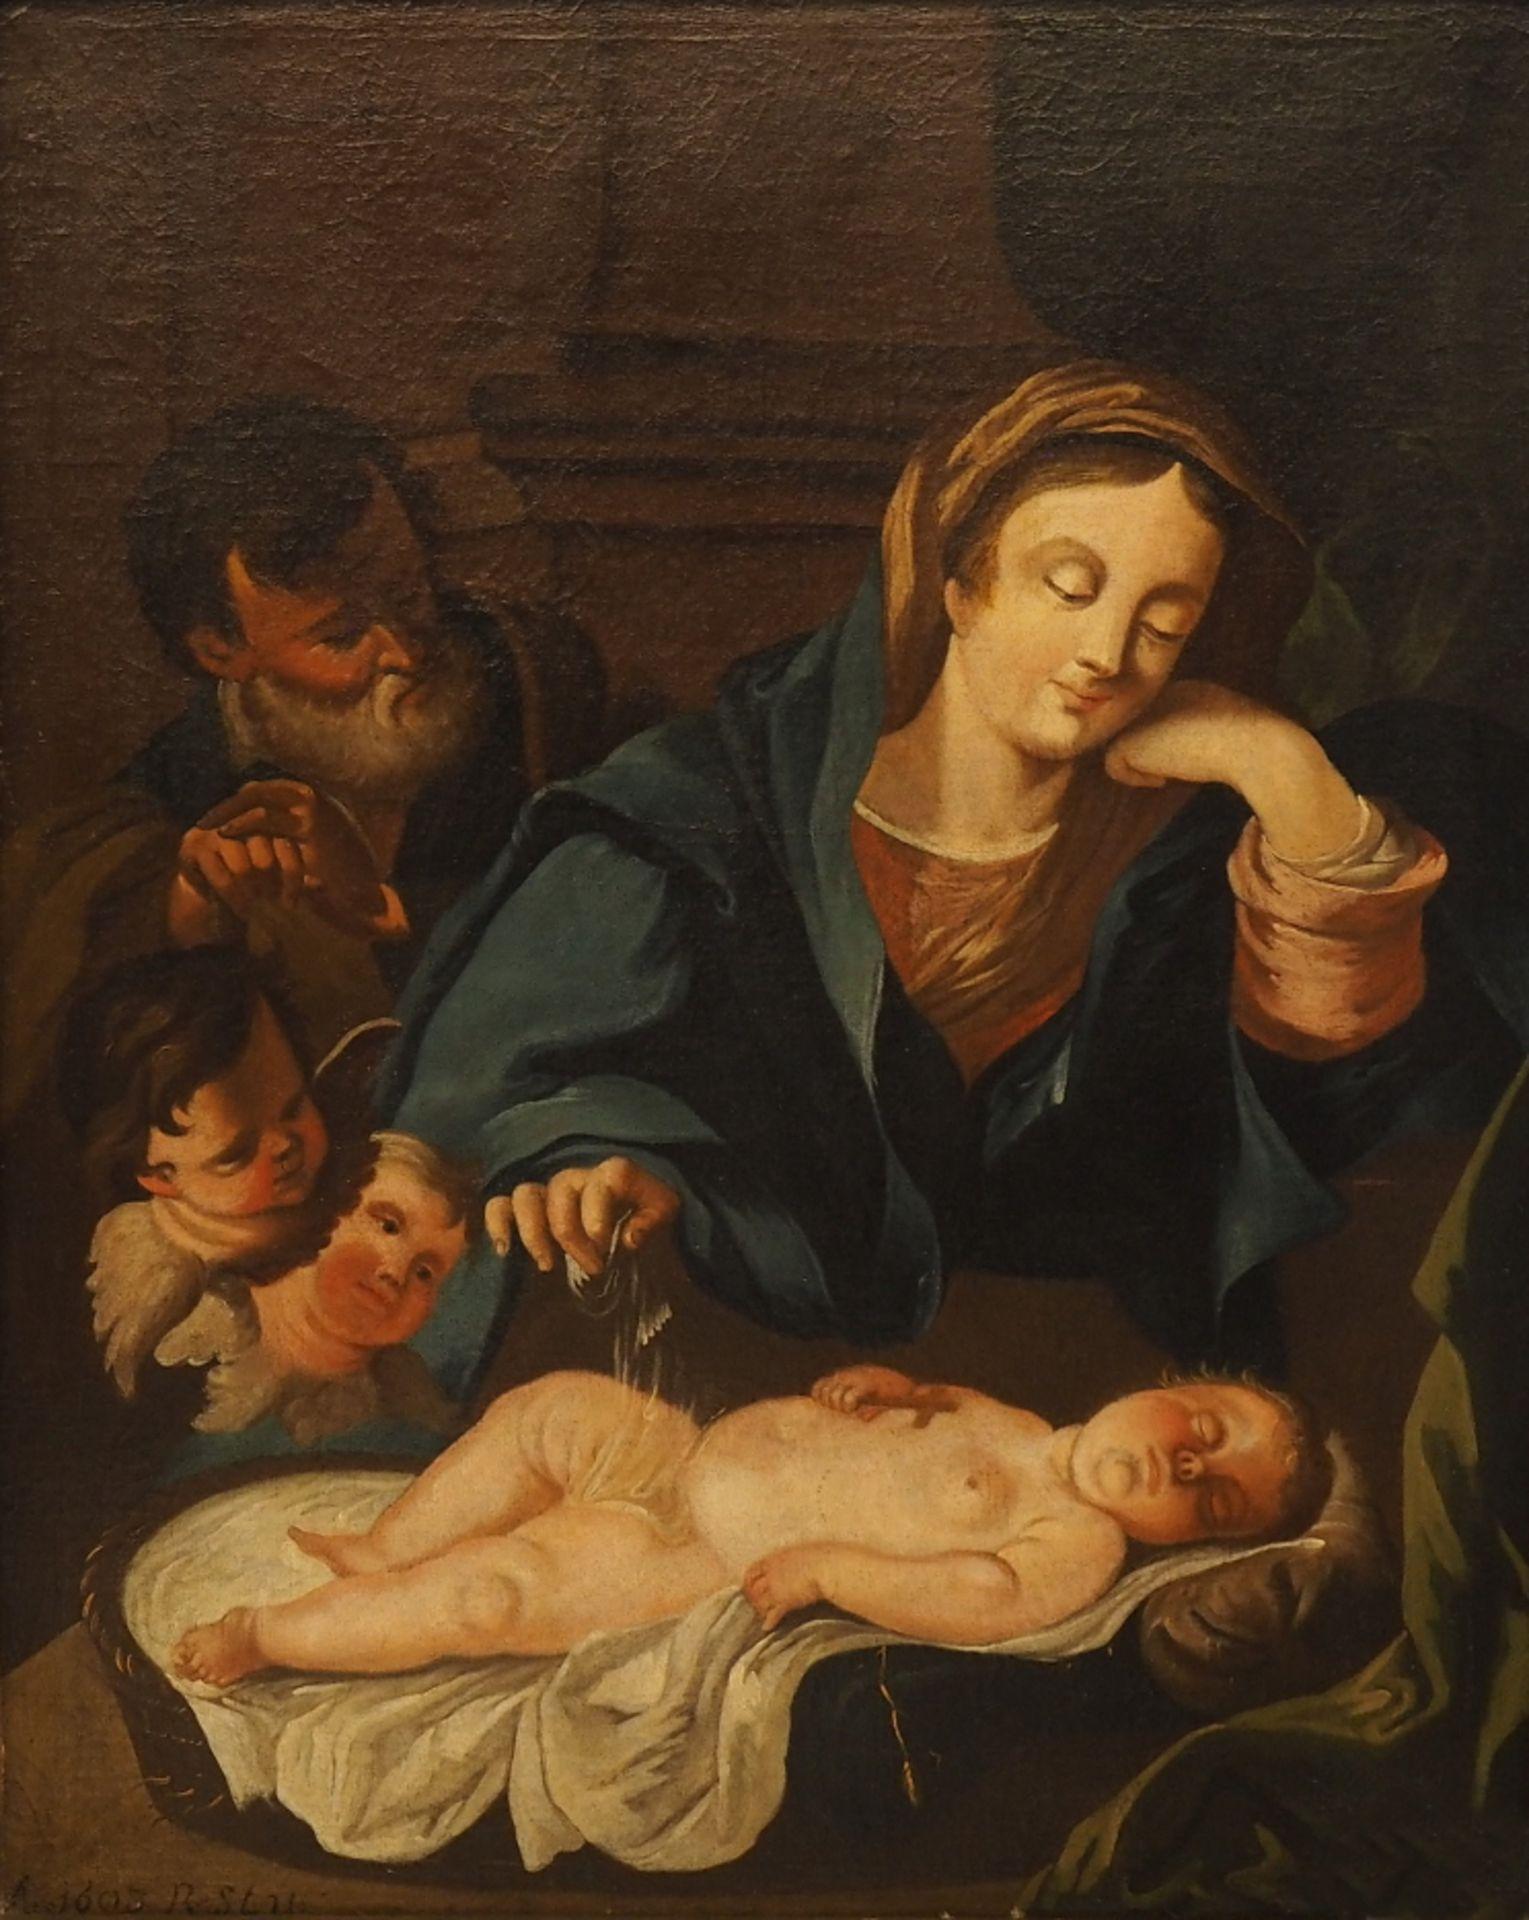 "1 Ölgemälde ""Heilige Familie"" L.u. bez./dat./monogr. ""1693 R. STU..."", Öl/Lwd., dou"